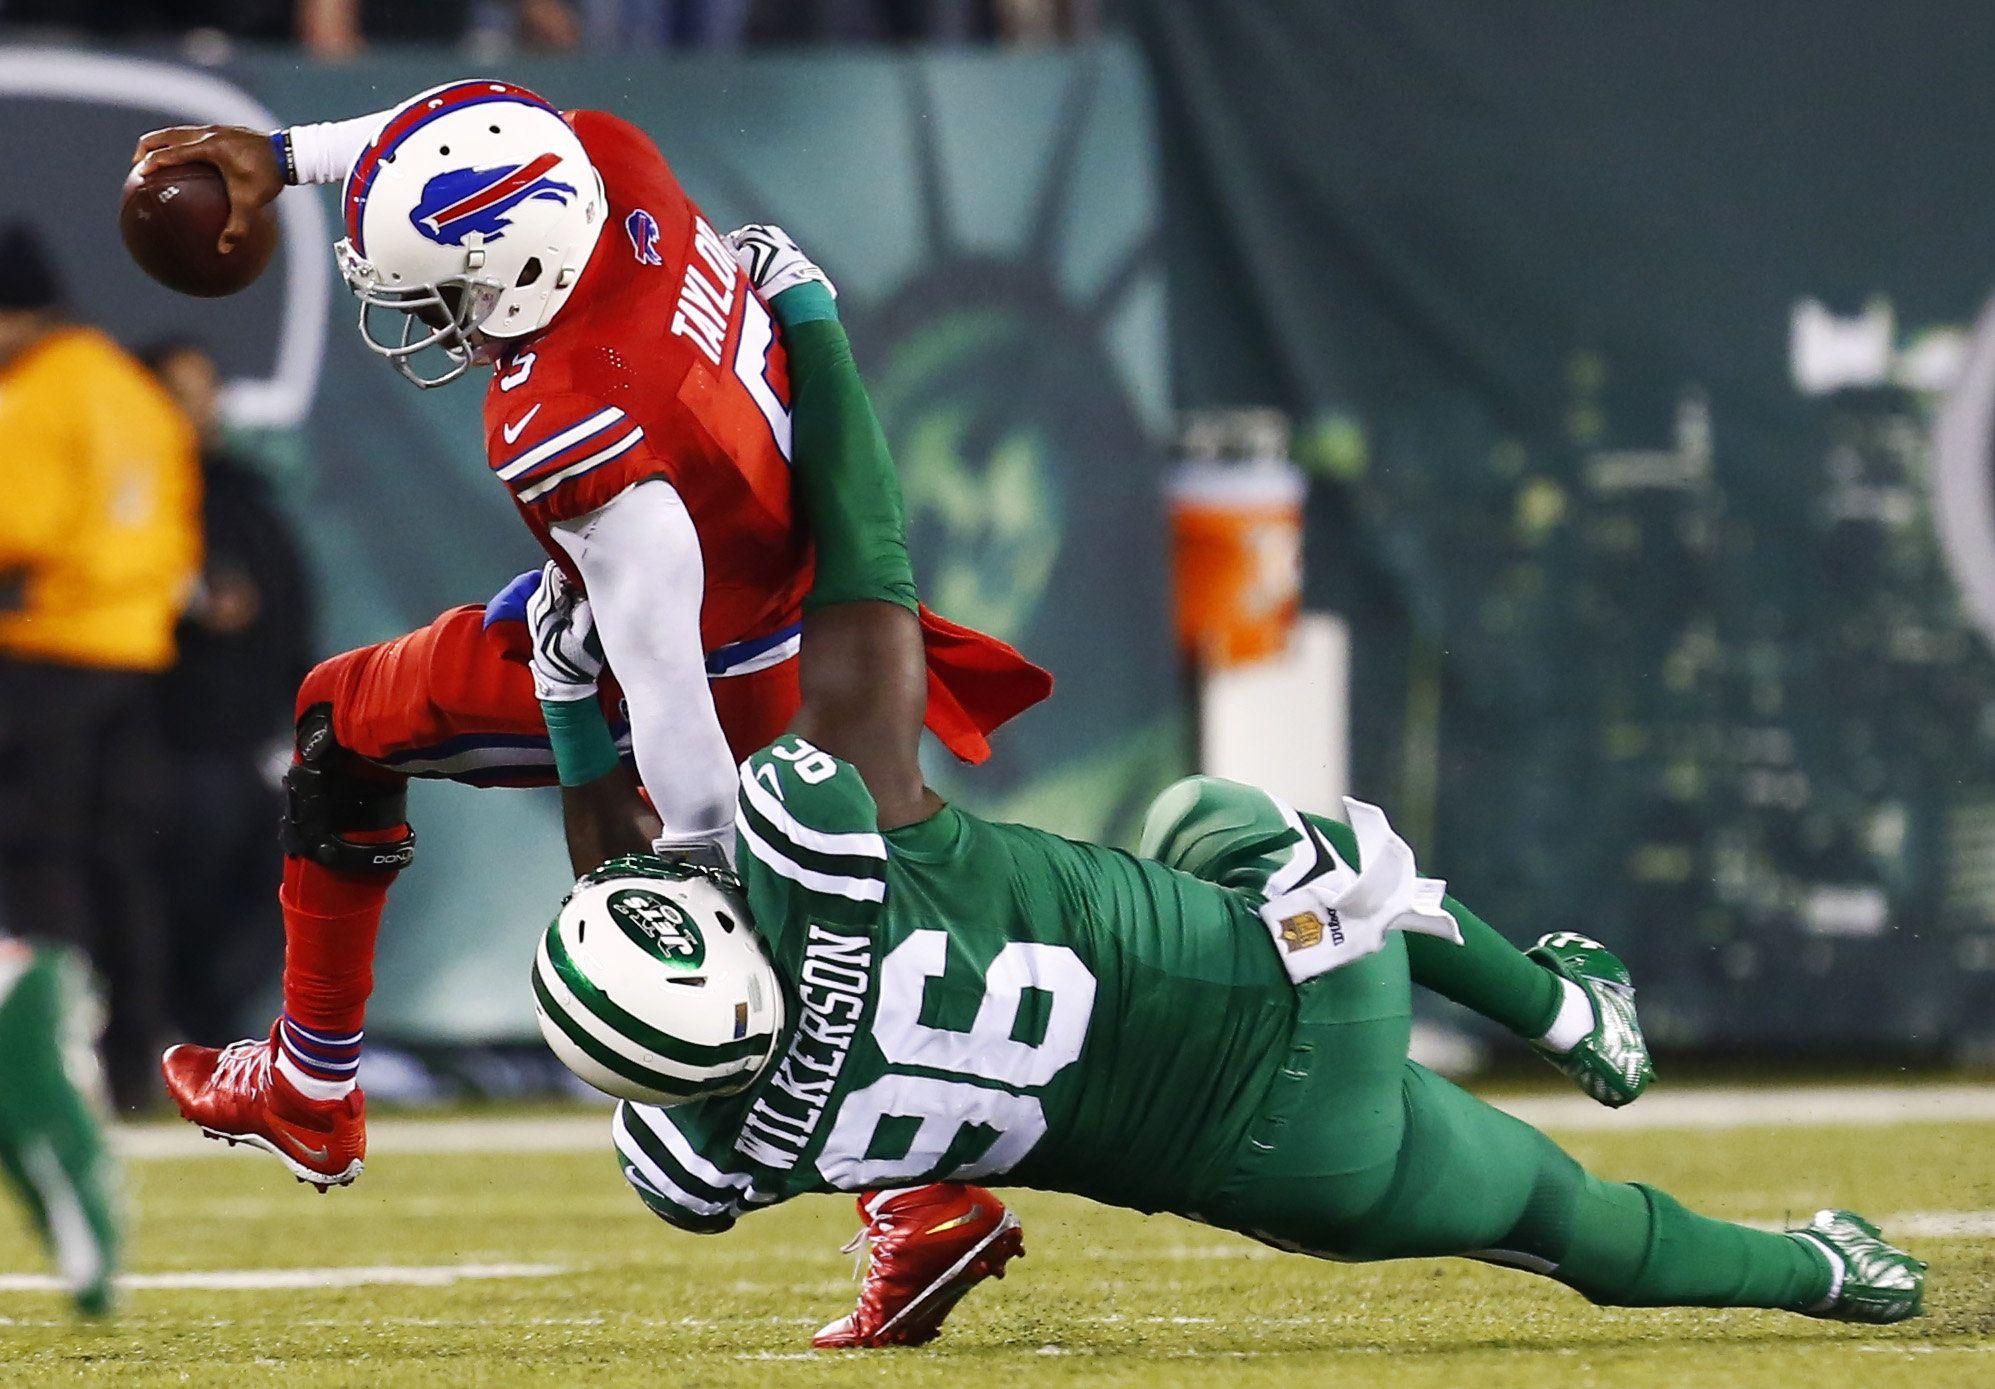 Watch Buffalo Bills vs New York Jets live streaming free